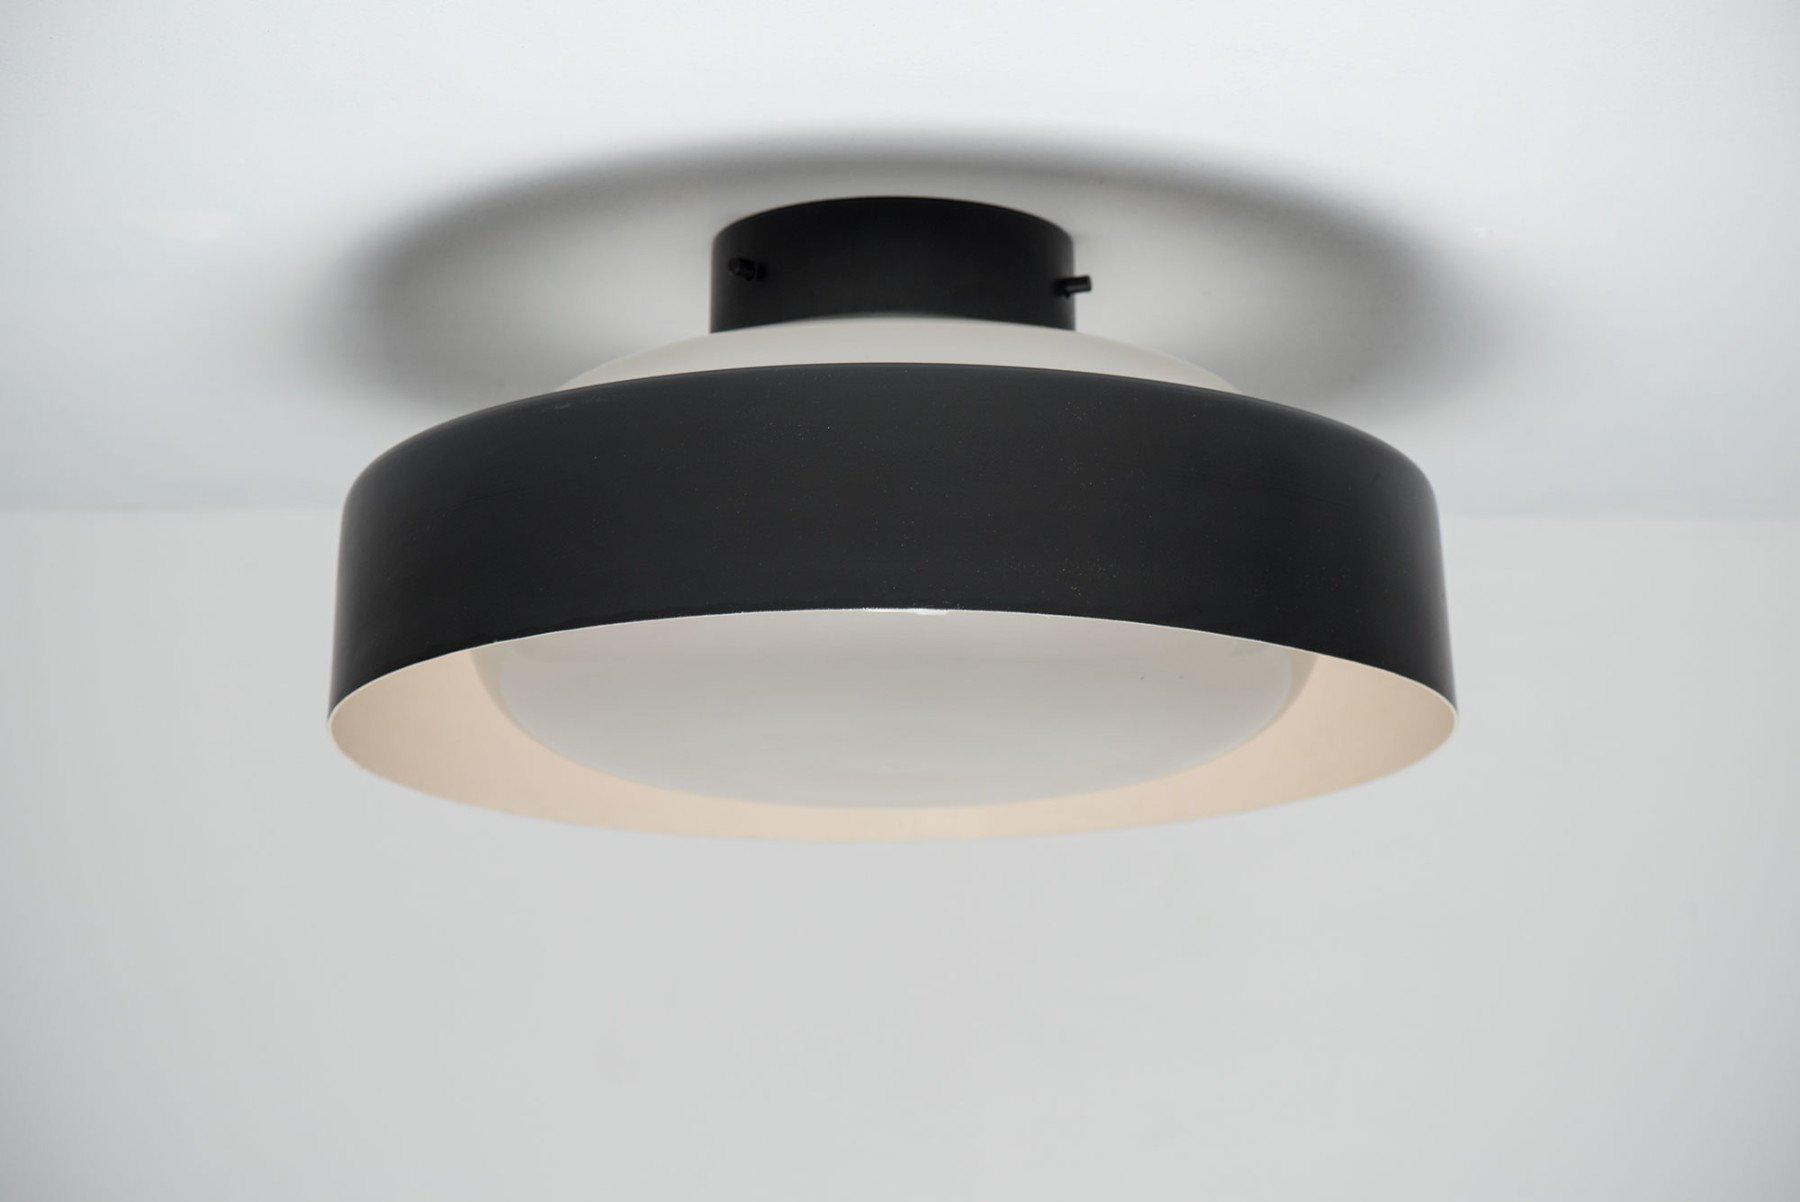 Gino Sarfatti |  Ceiling light, model 3053